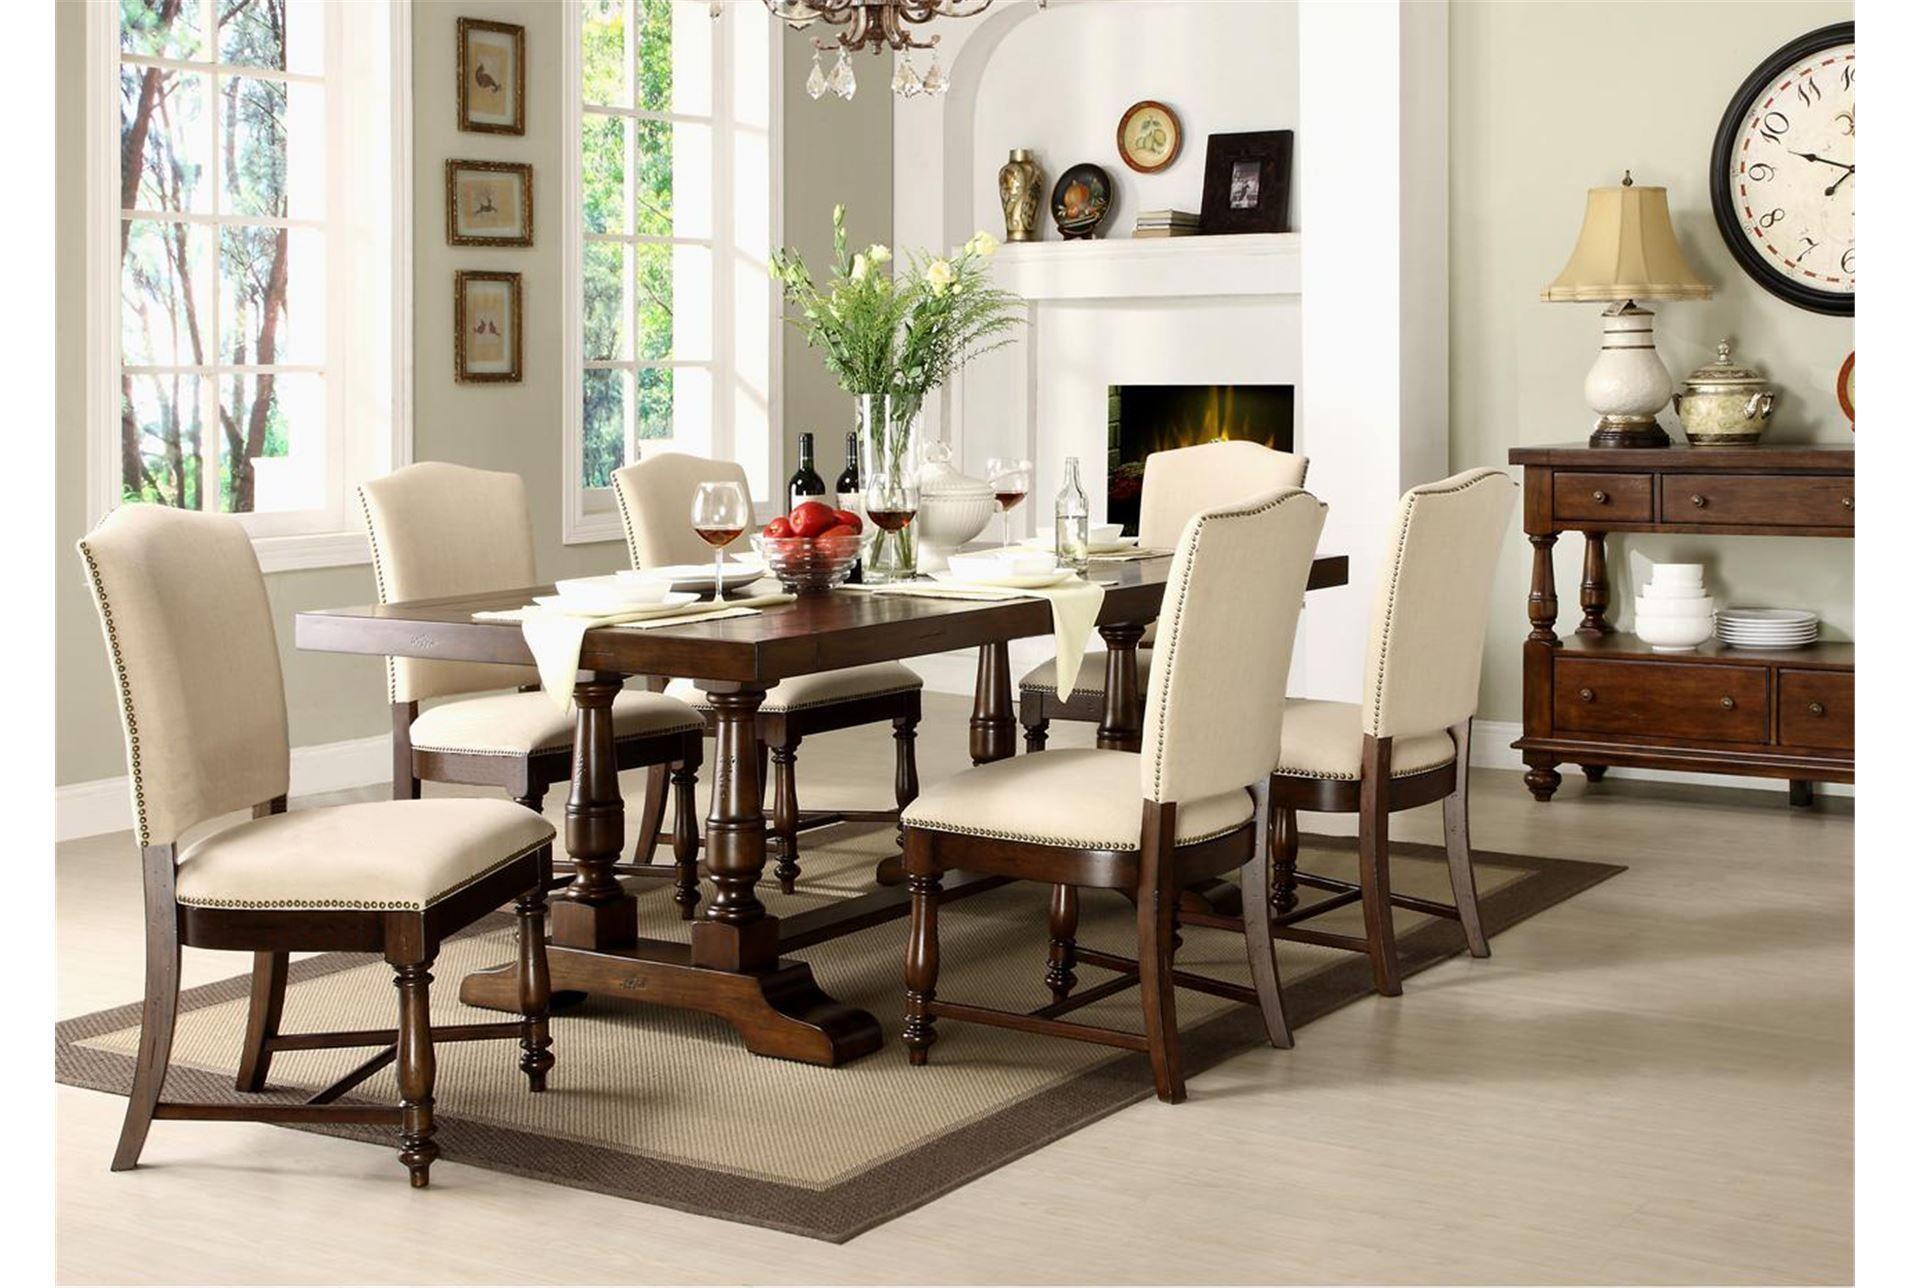 Arlo Uph 7 Piece Dining Set Dining Room Sets Riverside Furniture Dining Room Furniture